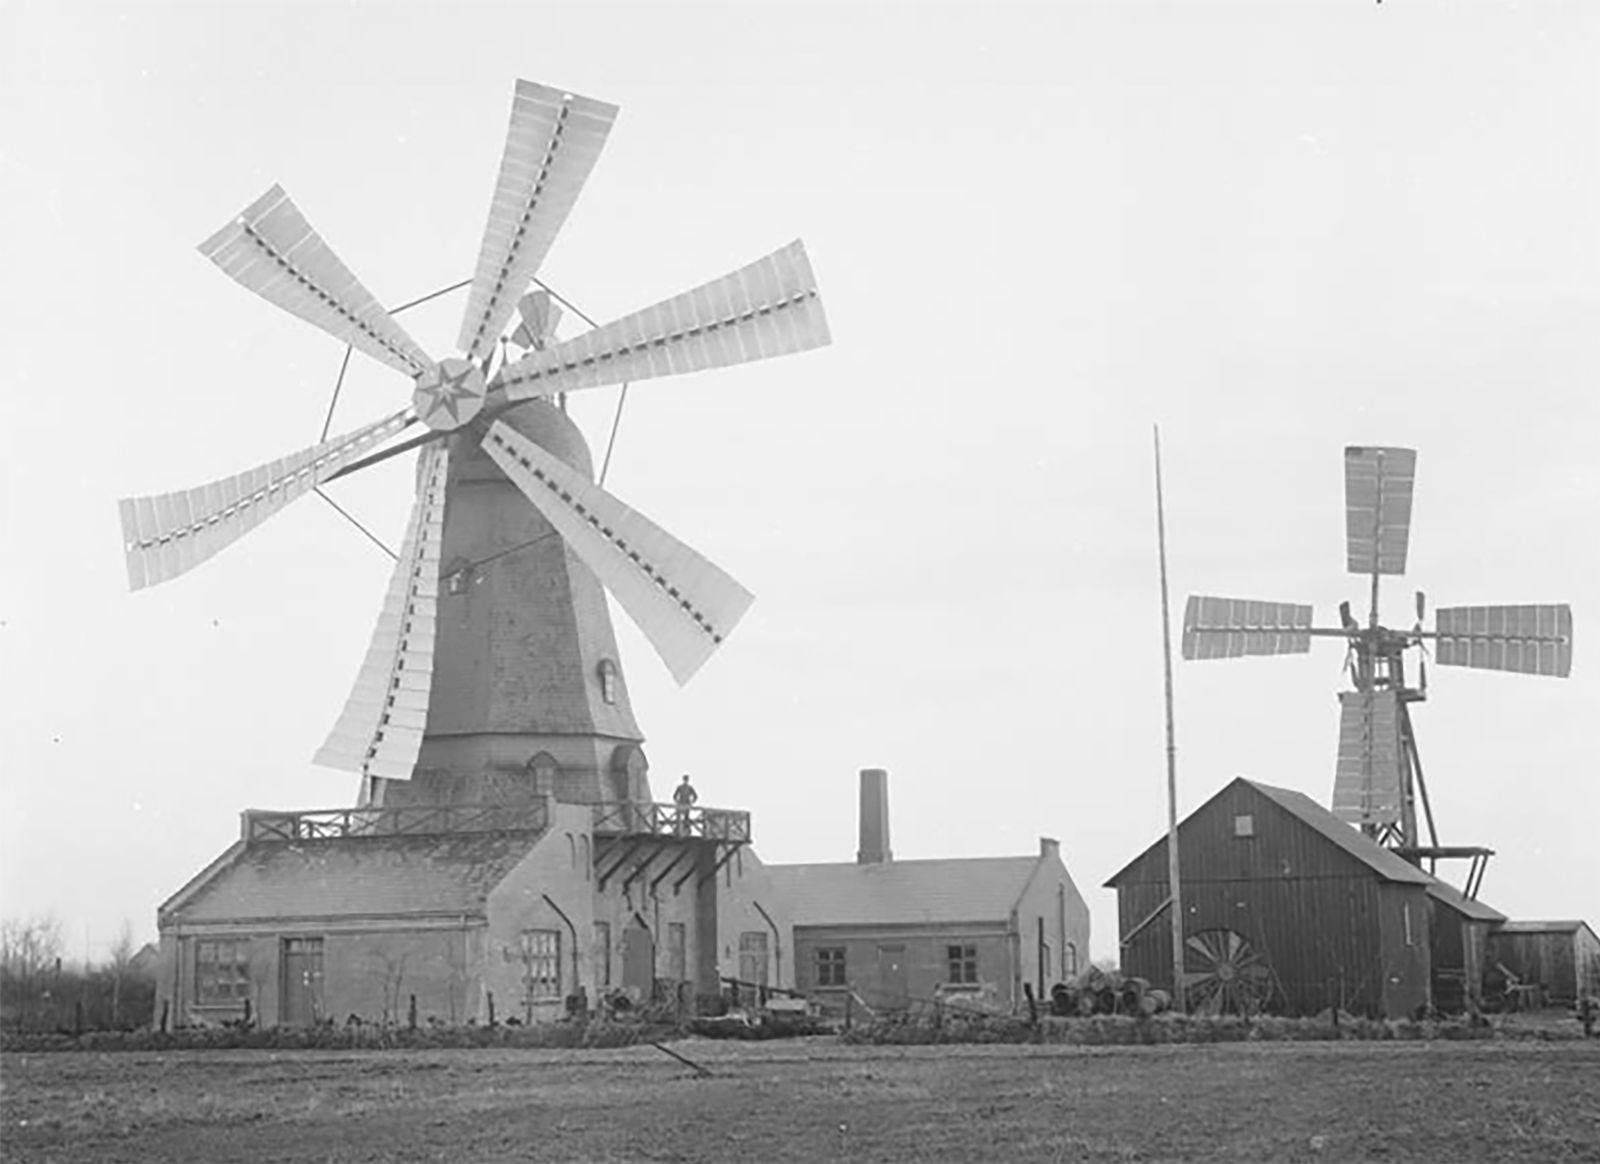 Windkraft Pioniere - Poul la Cours wind laboratory